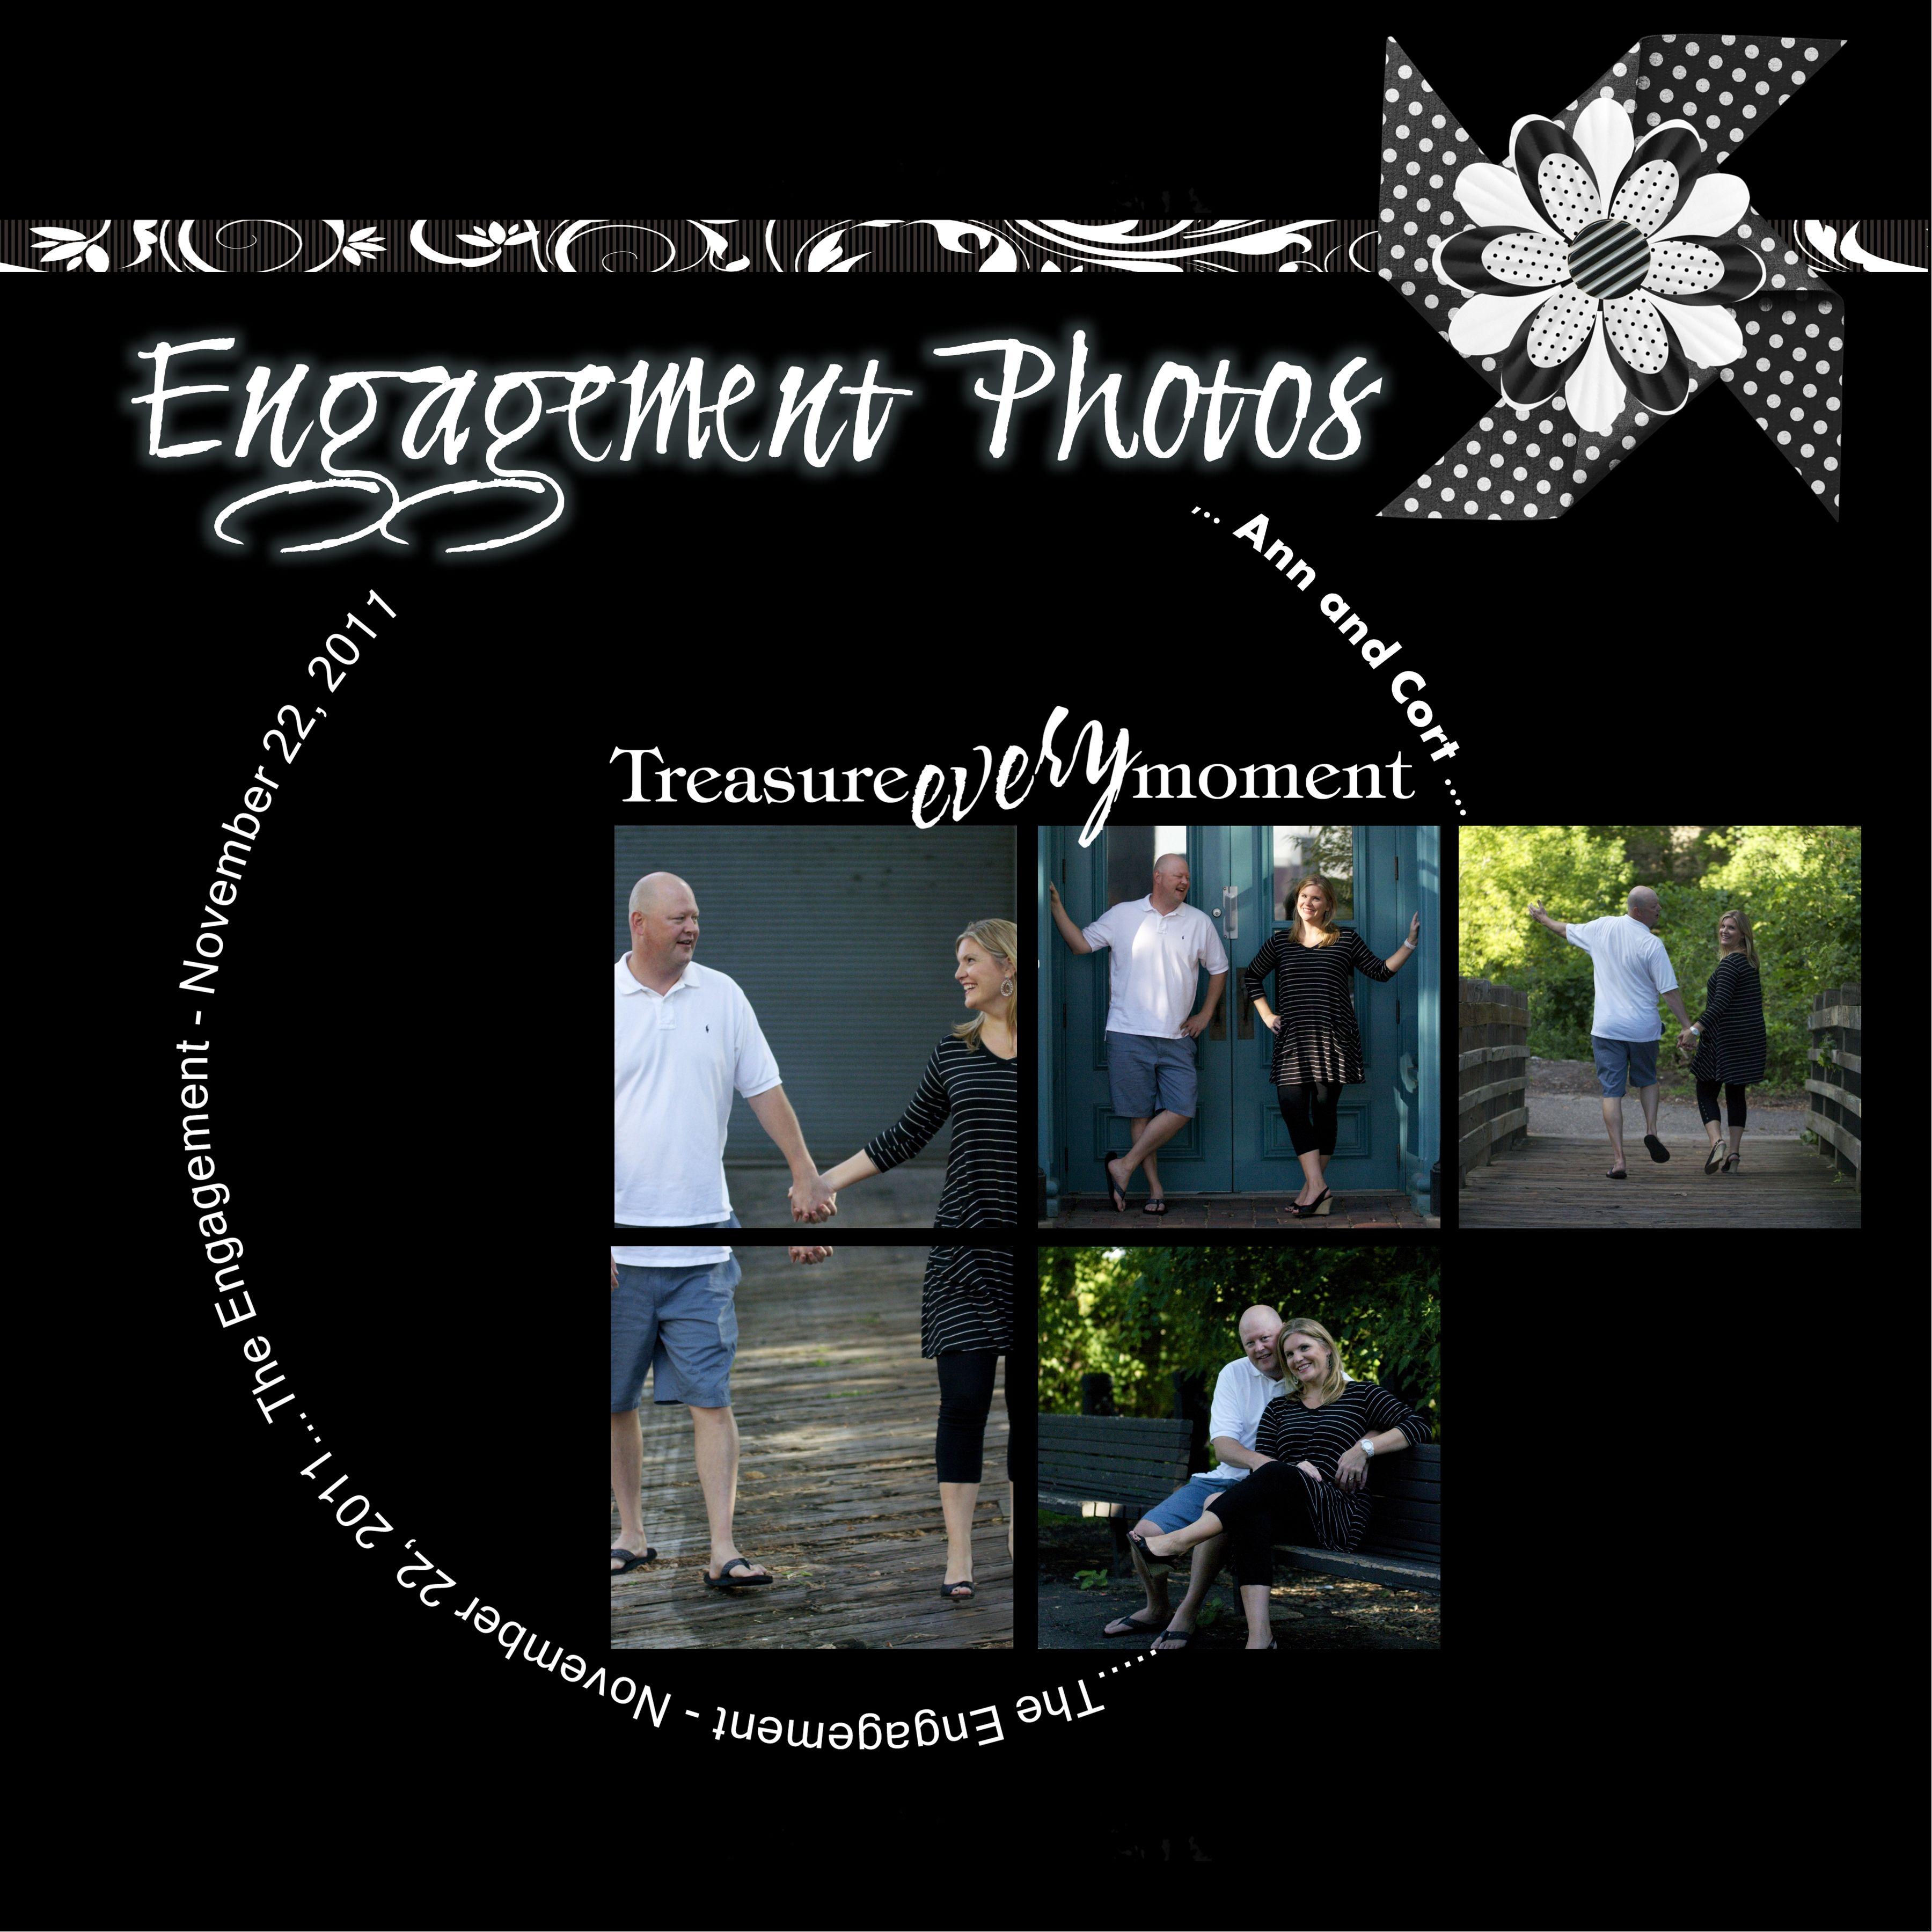 Scrapbook ideas engagement - Layout Engagement Photos